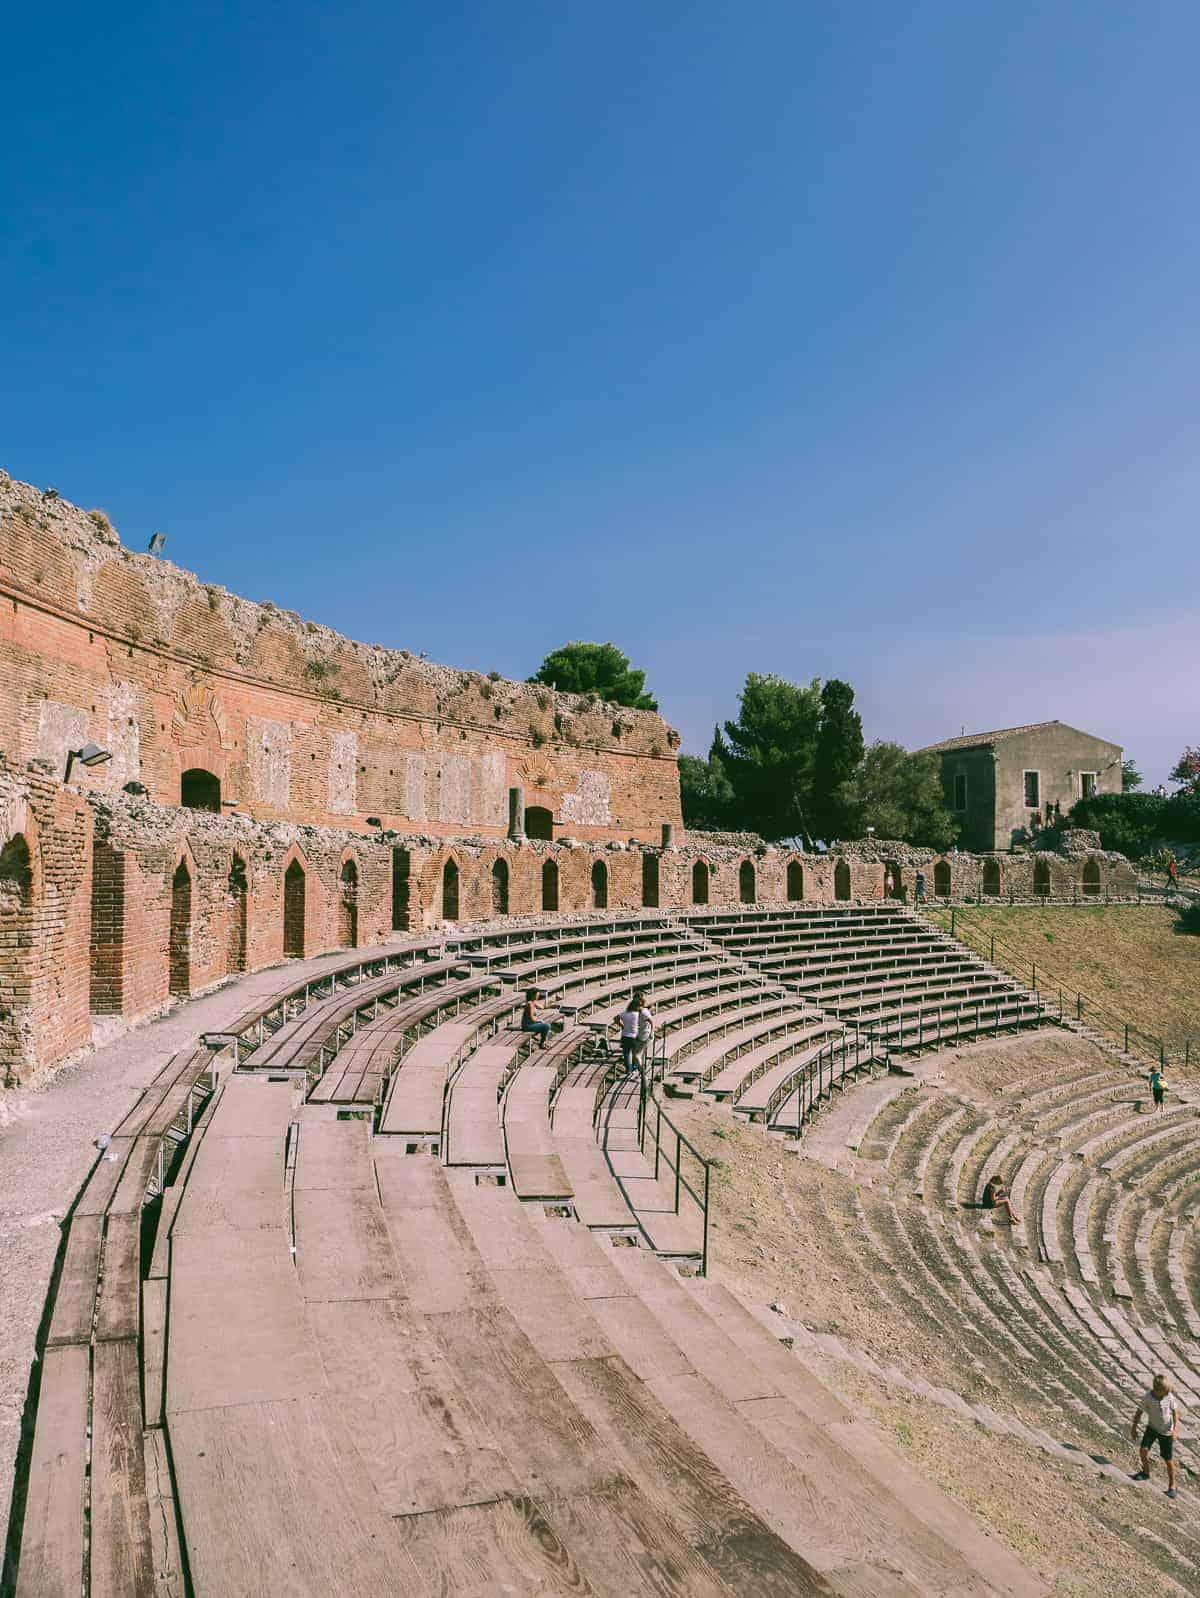 amphitheatre steps located in Teatro Greco in Taormina Sicily